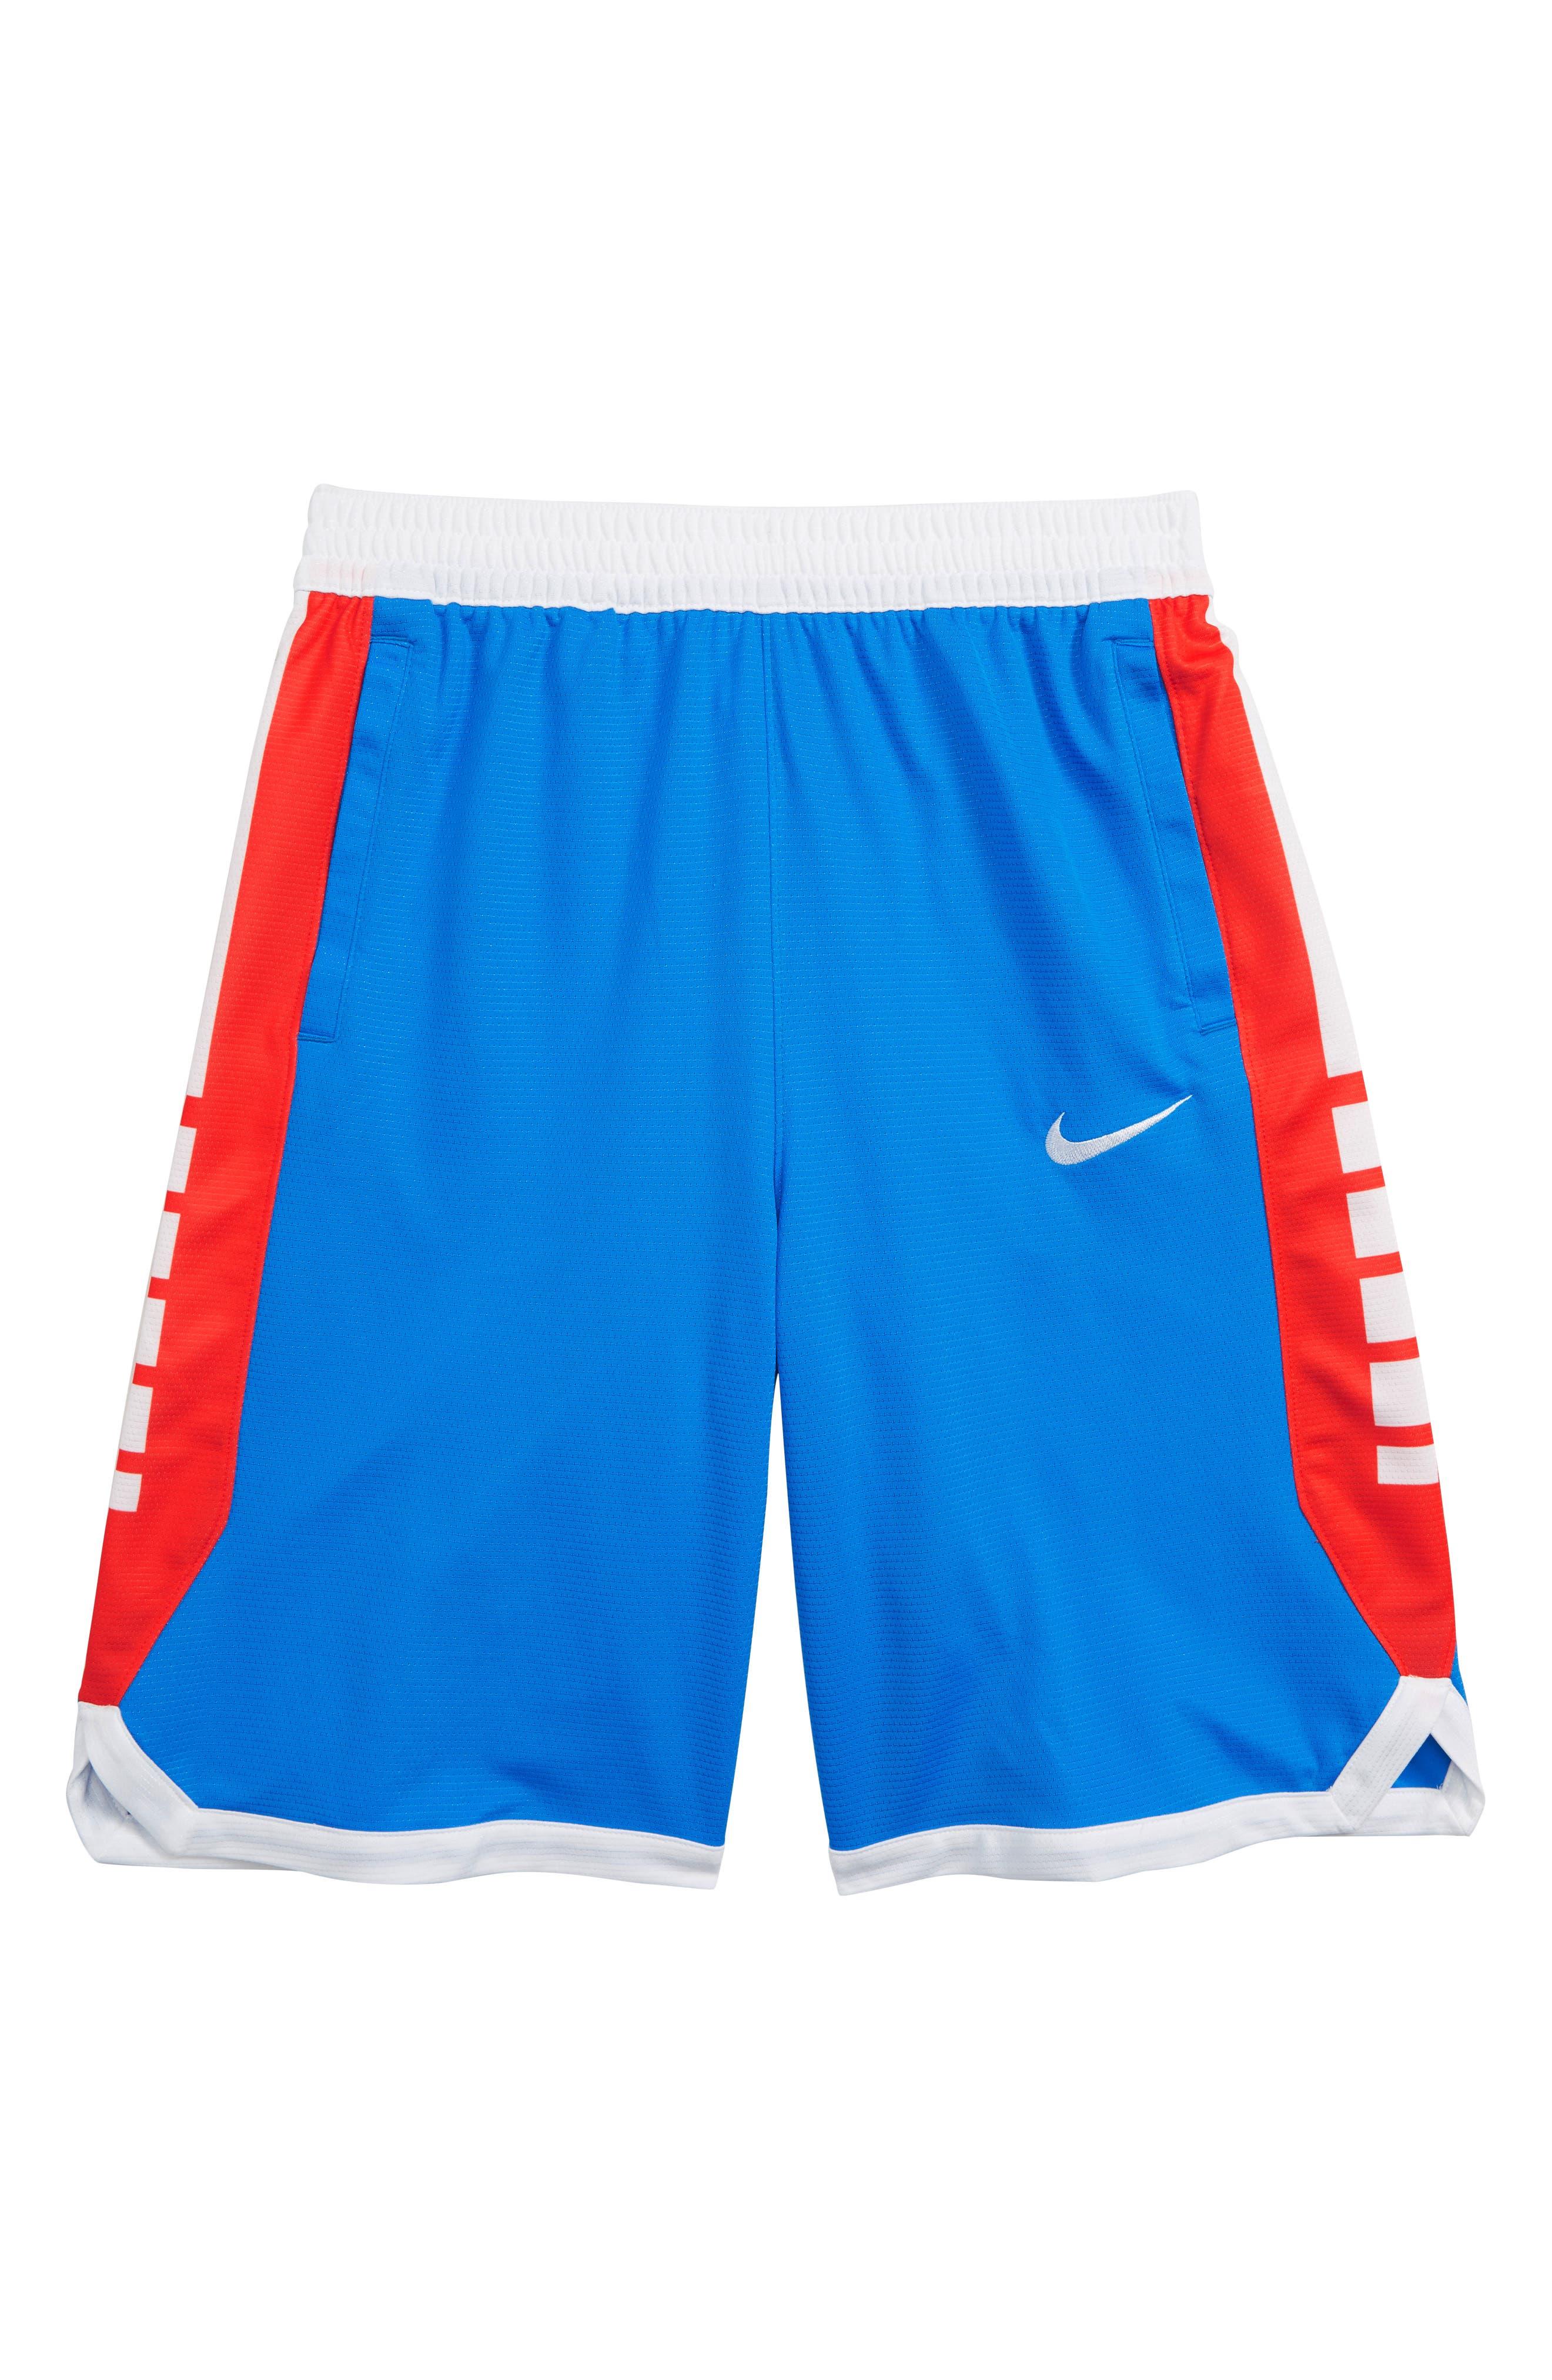 b399ecf4b40f nike elite shorts youth